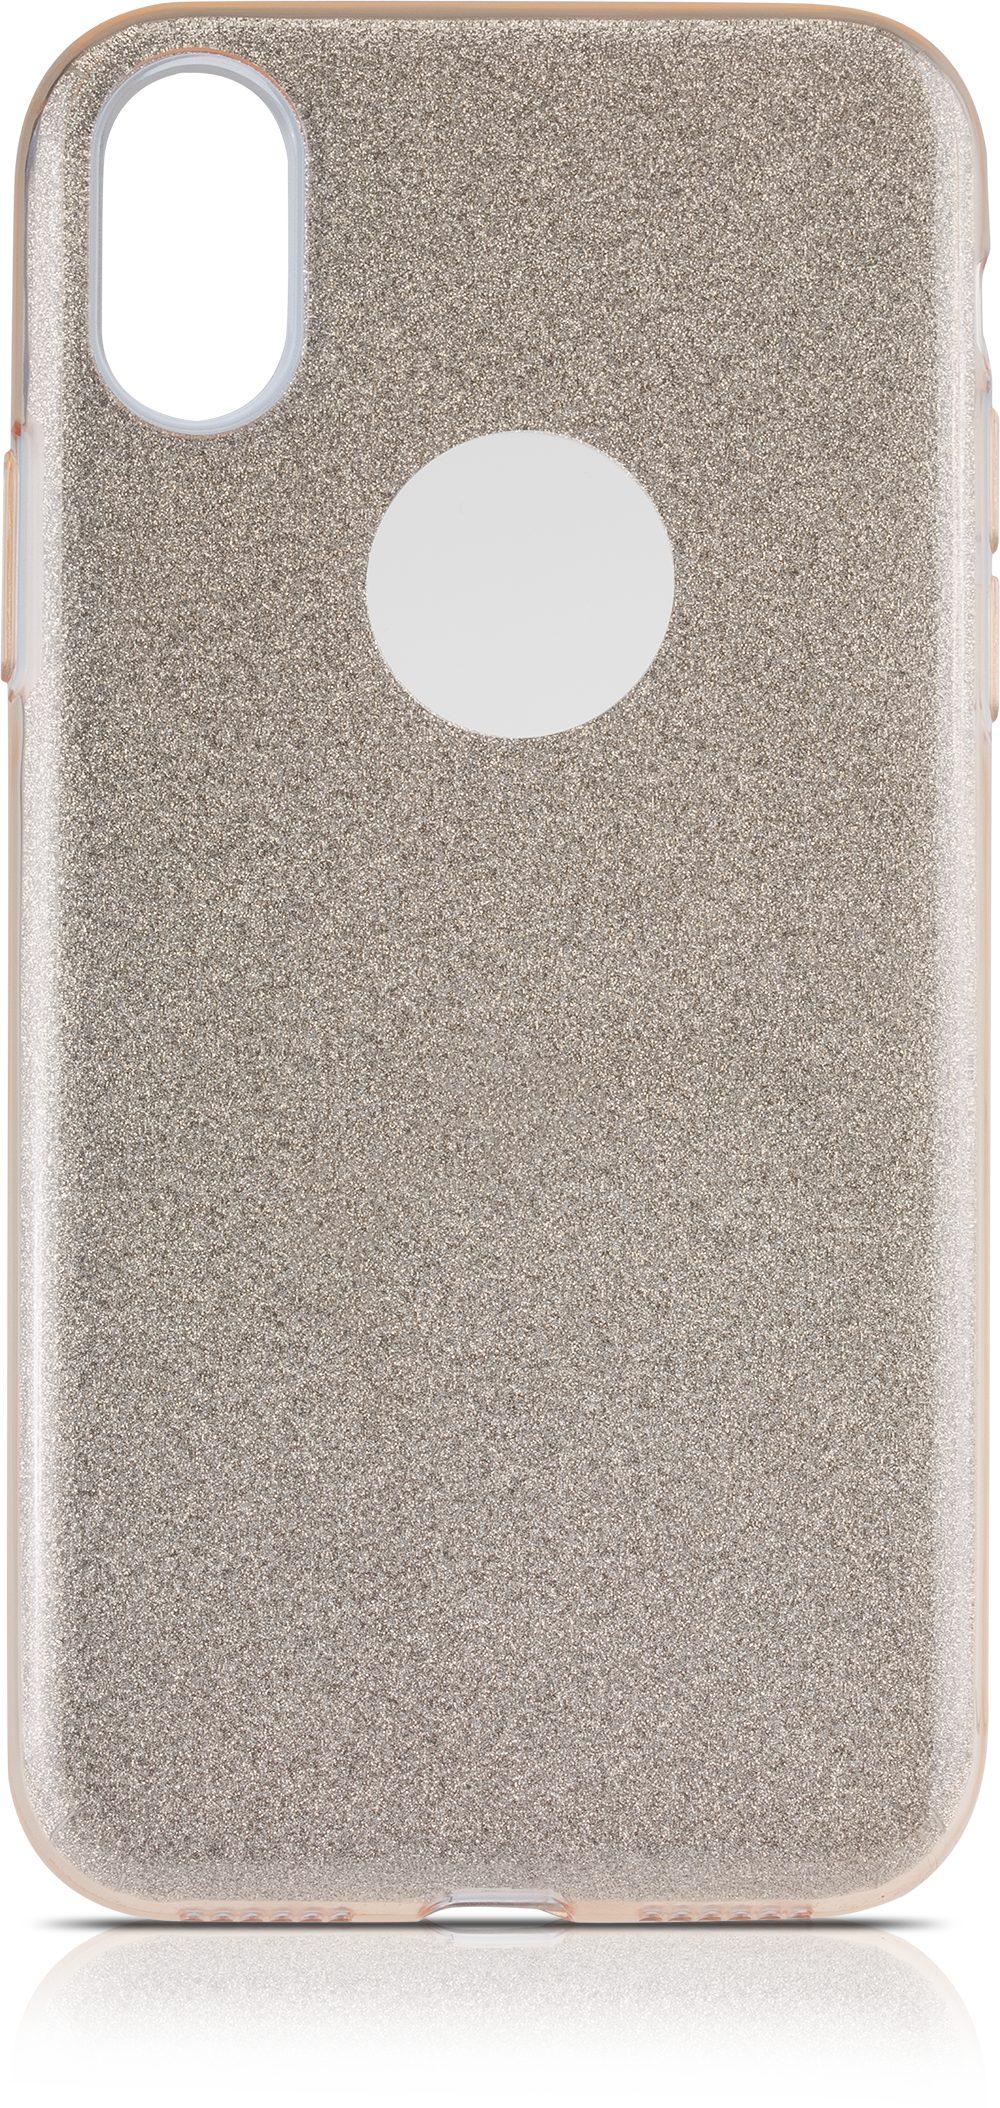 Scutes Deluxe GSM - Zubehör »Schutzhülle TPU - iPhone 8 glitzer gold«